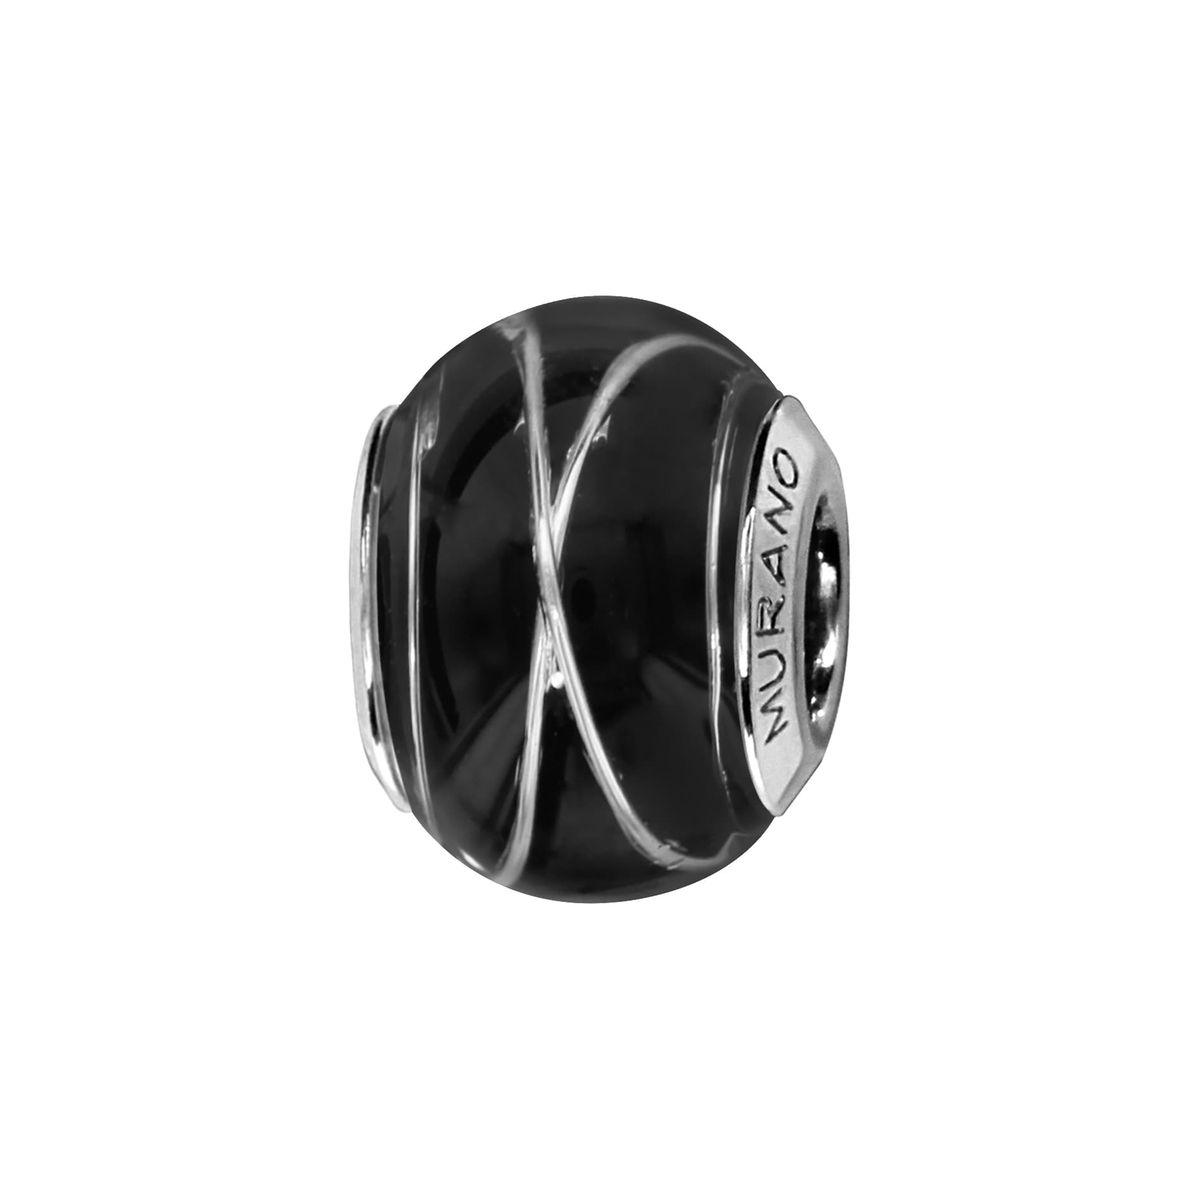 Charm Verre de Murano Nuit Fil Argent 925 - Compatible Pandora, Trollbeads, Chamilia, Biagi